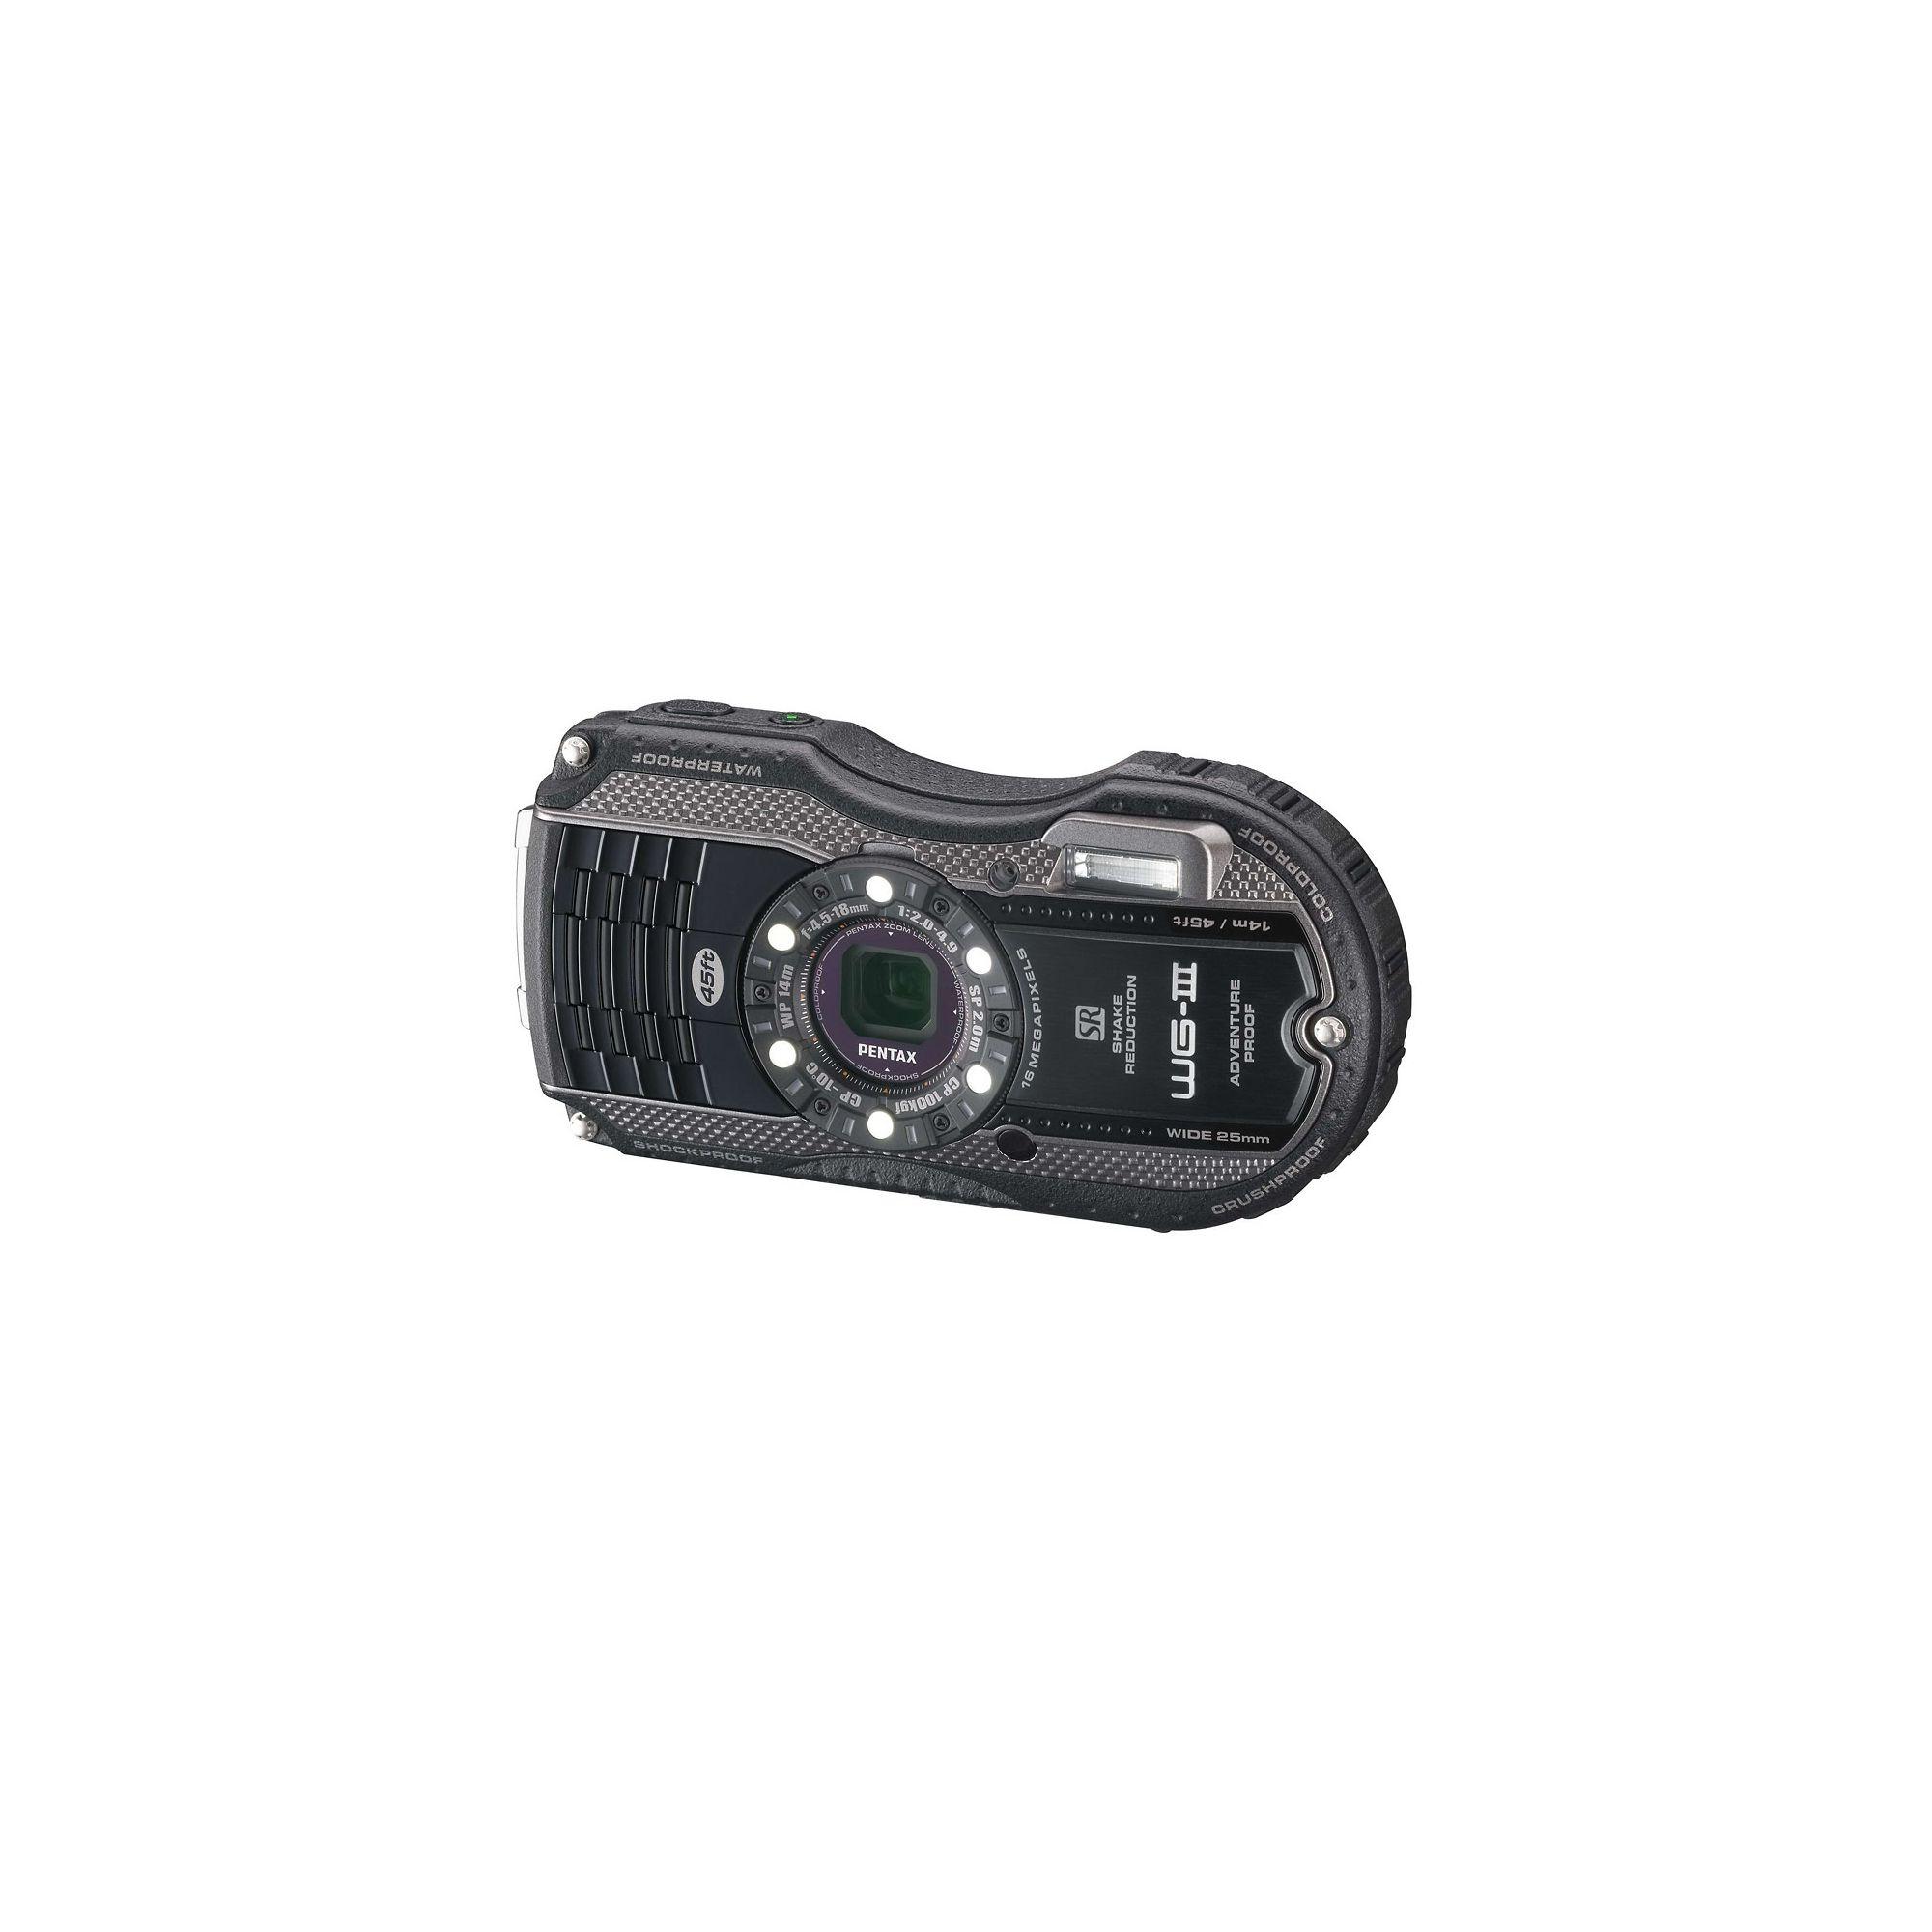 Pentax WG-3 Durable Black Digital Camera